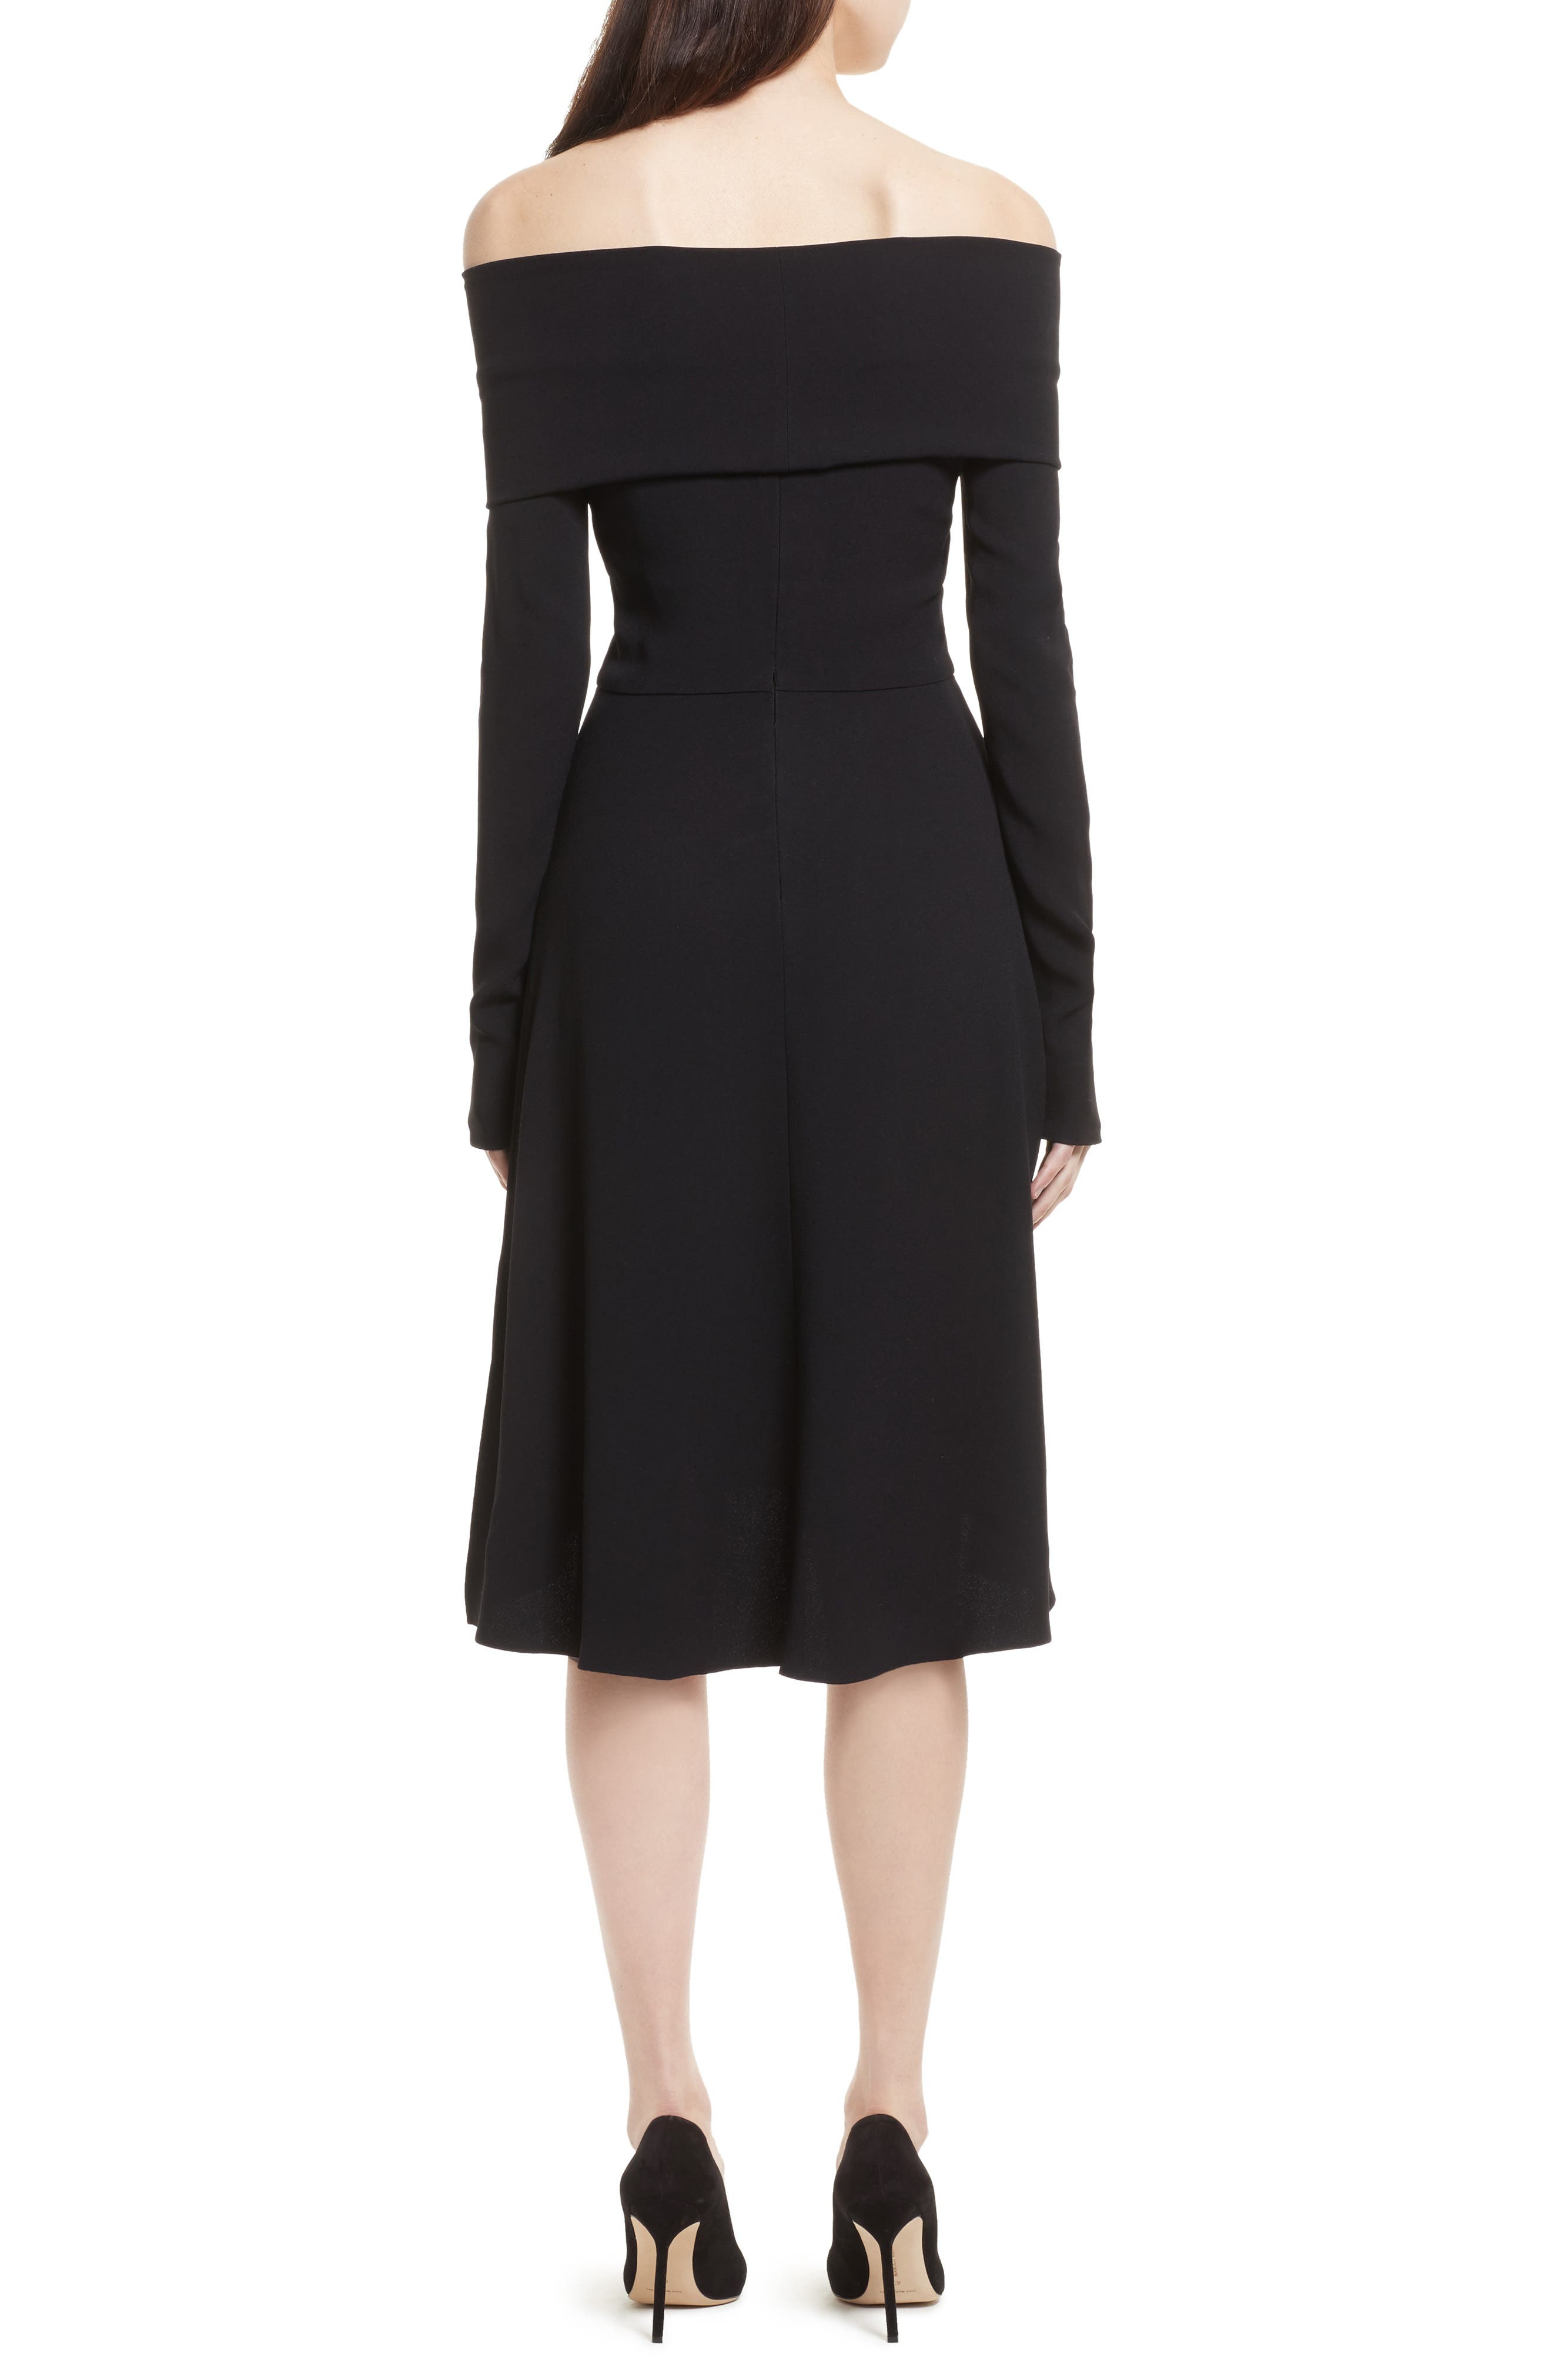 Kensington Off the Shoulder Foldover Dress,                             Alternate thumbnail 2, color,